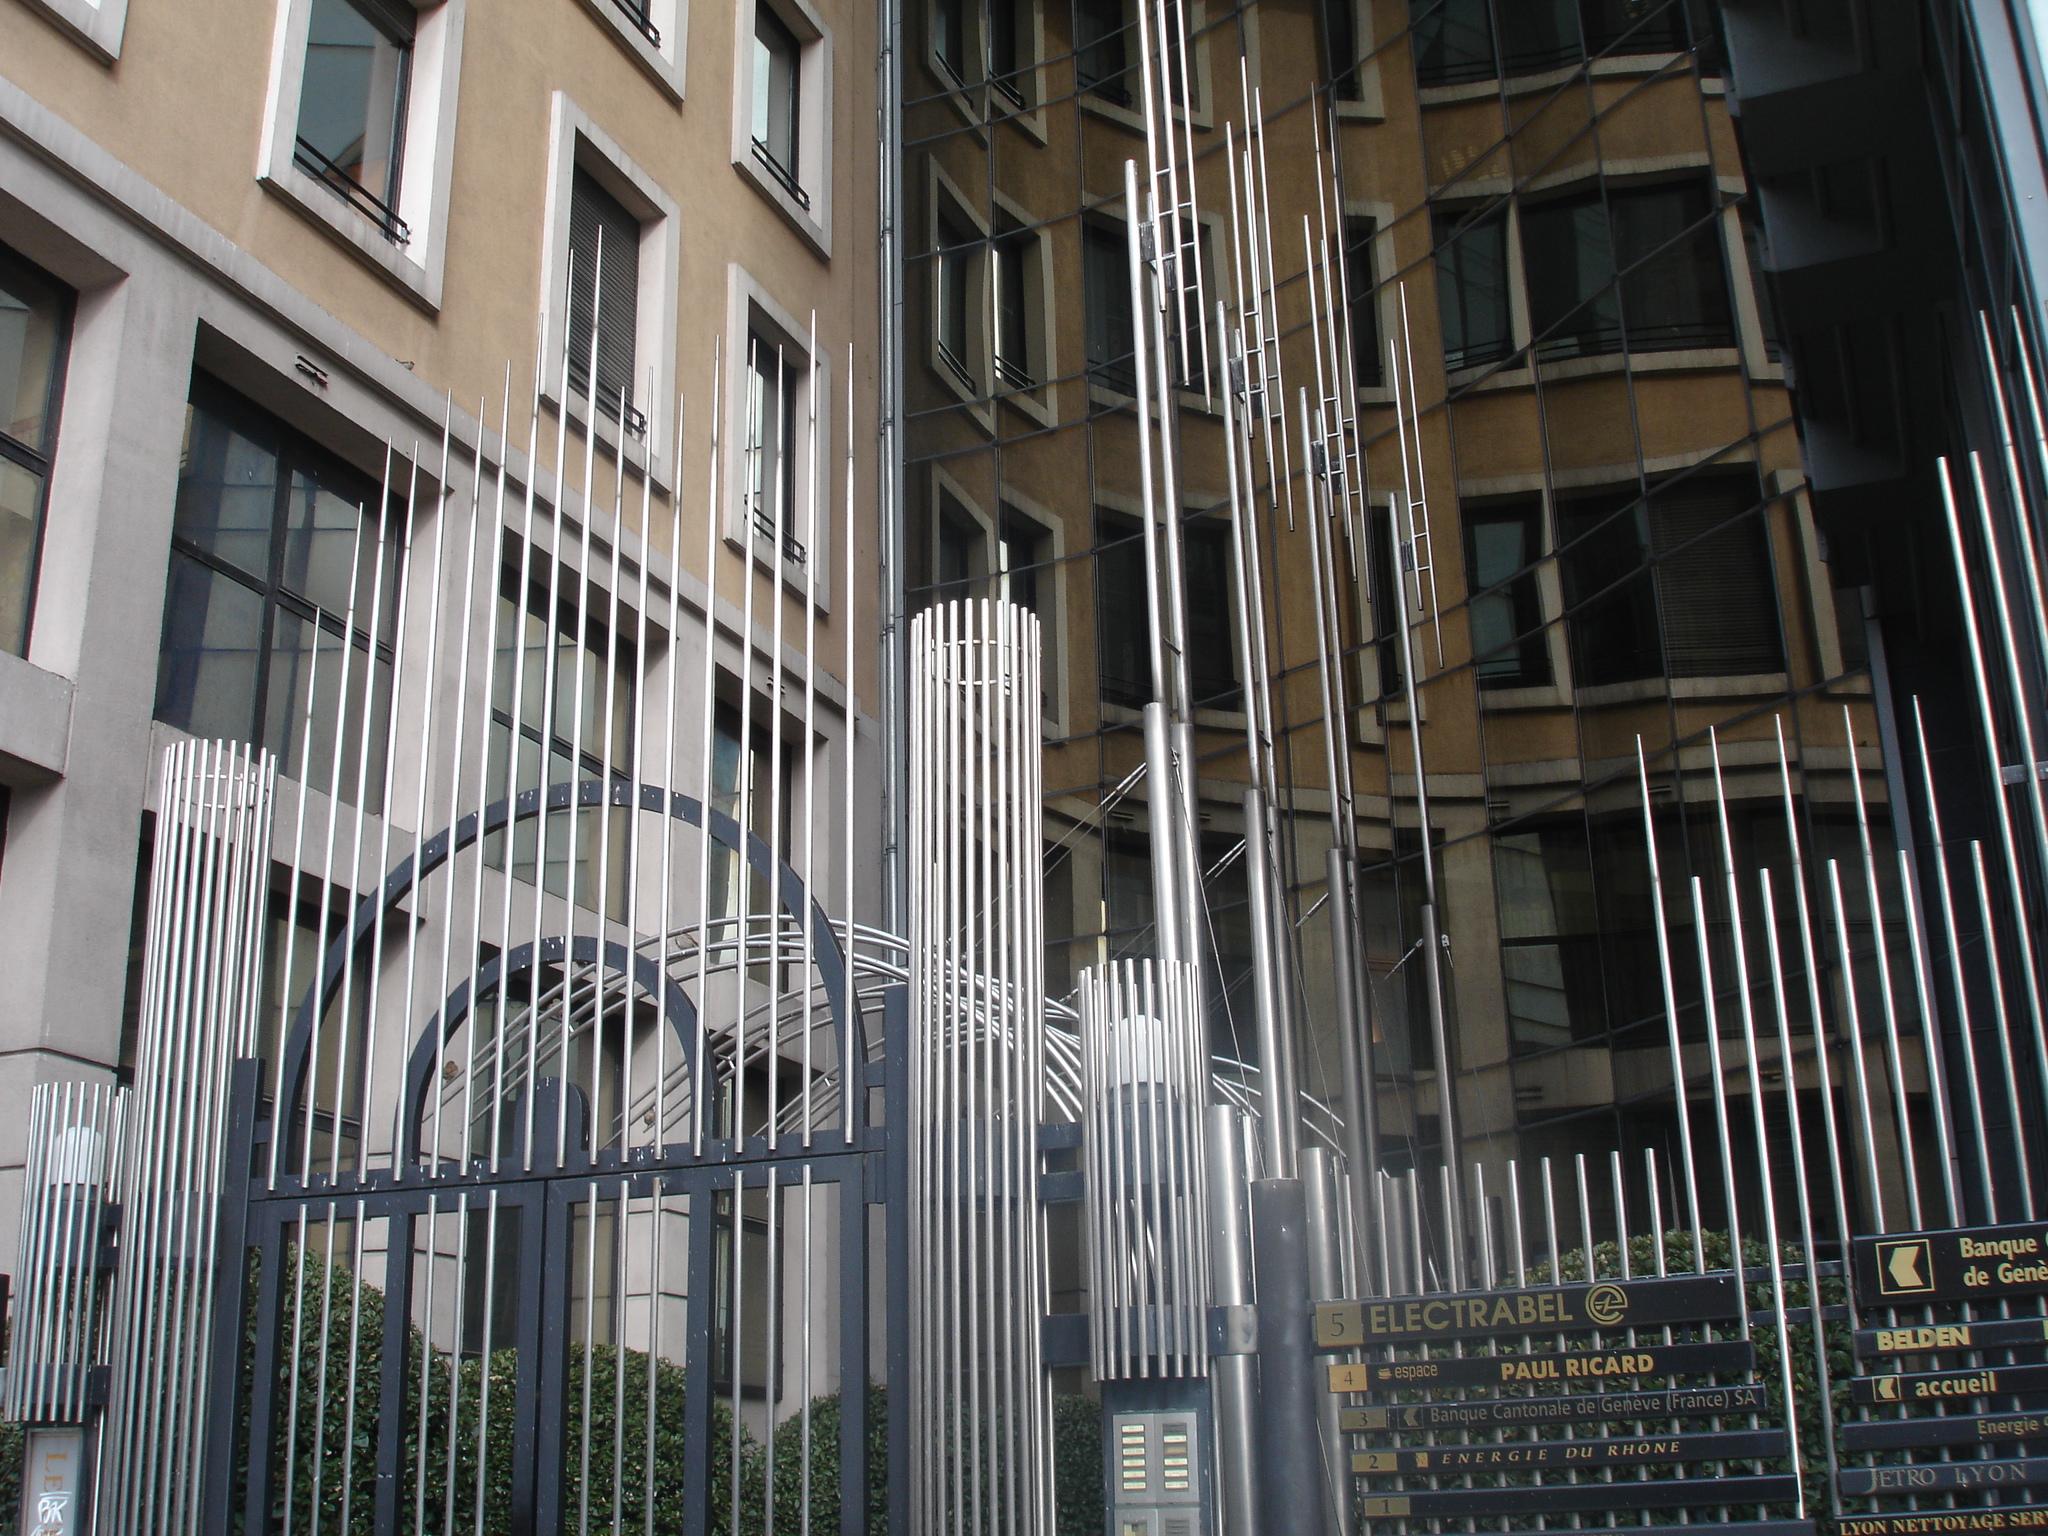 Entreprise D Architecture Lyon file:lyon pradel immeuble d'entreprises - wikimedia commons